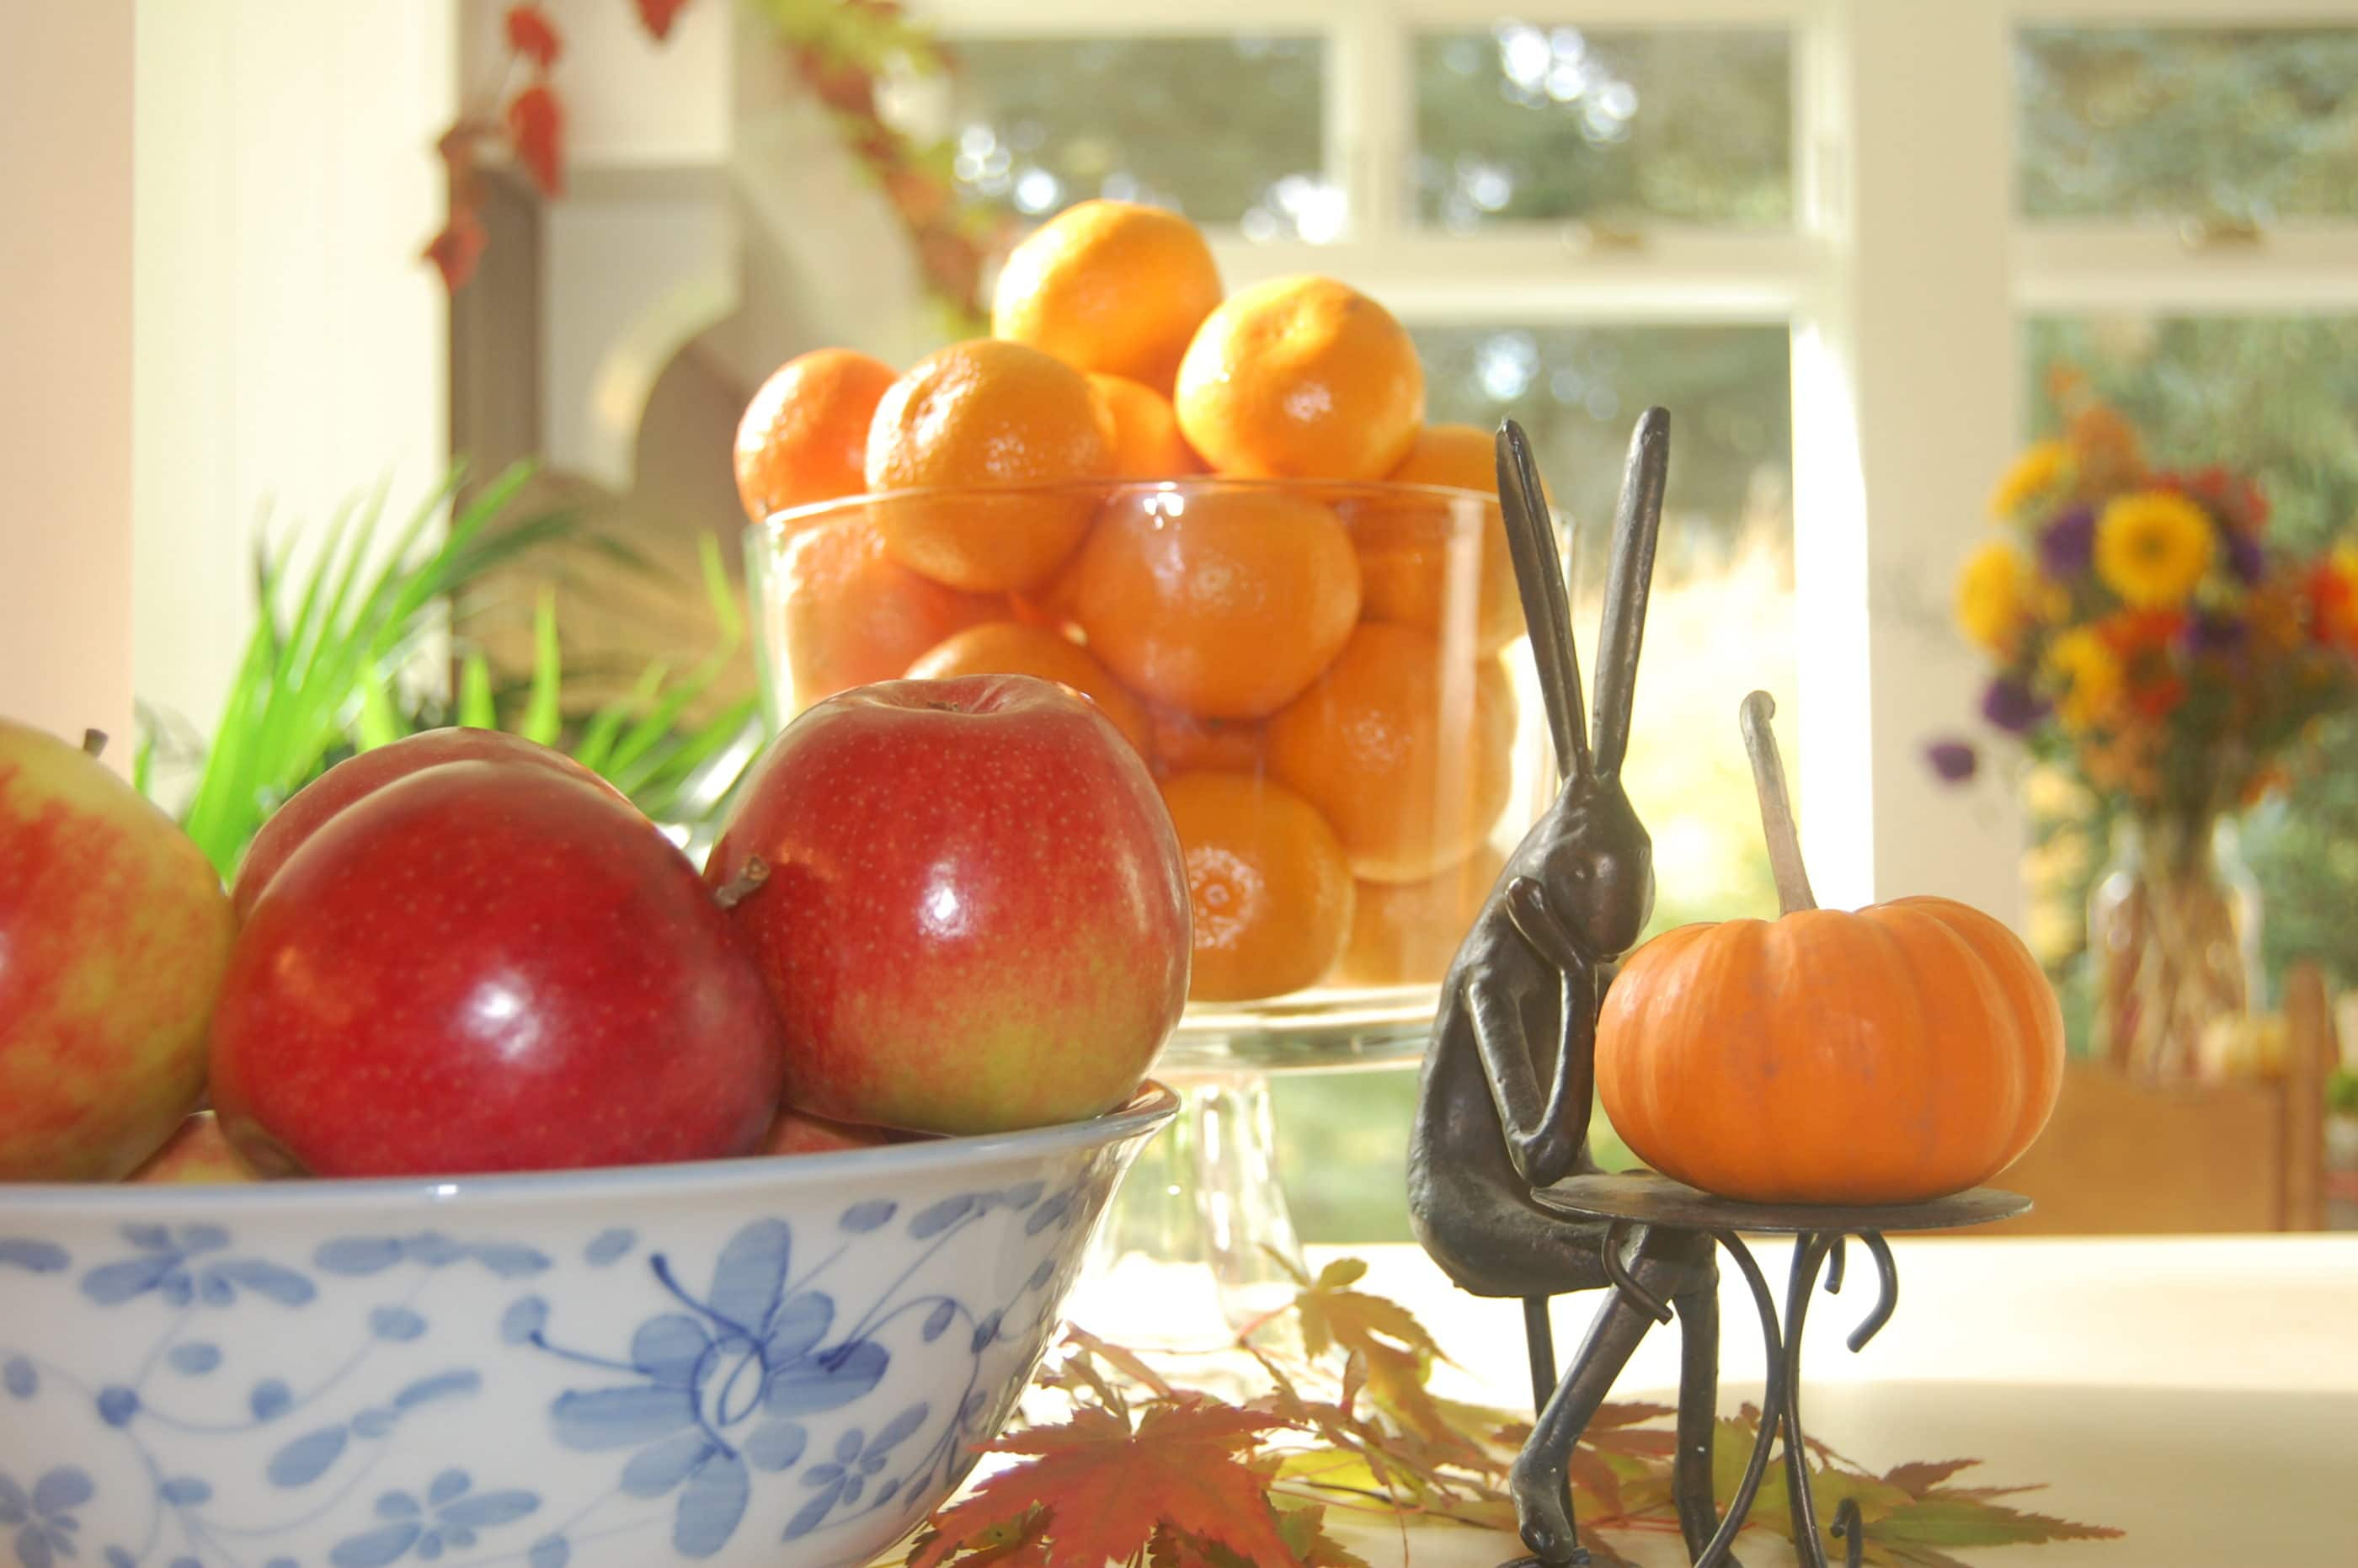 fall decor for holiday decorating pumpkins